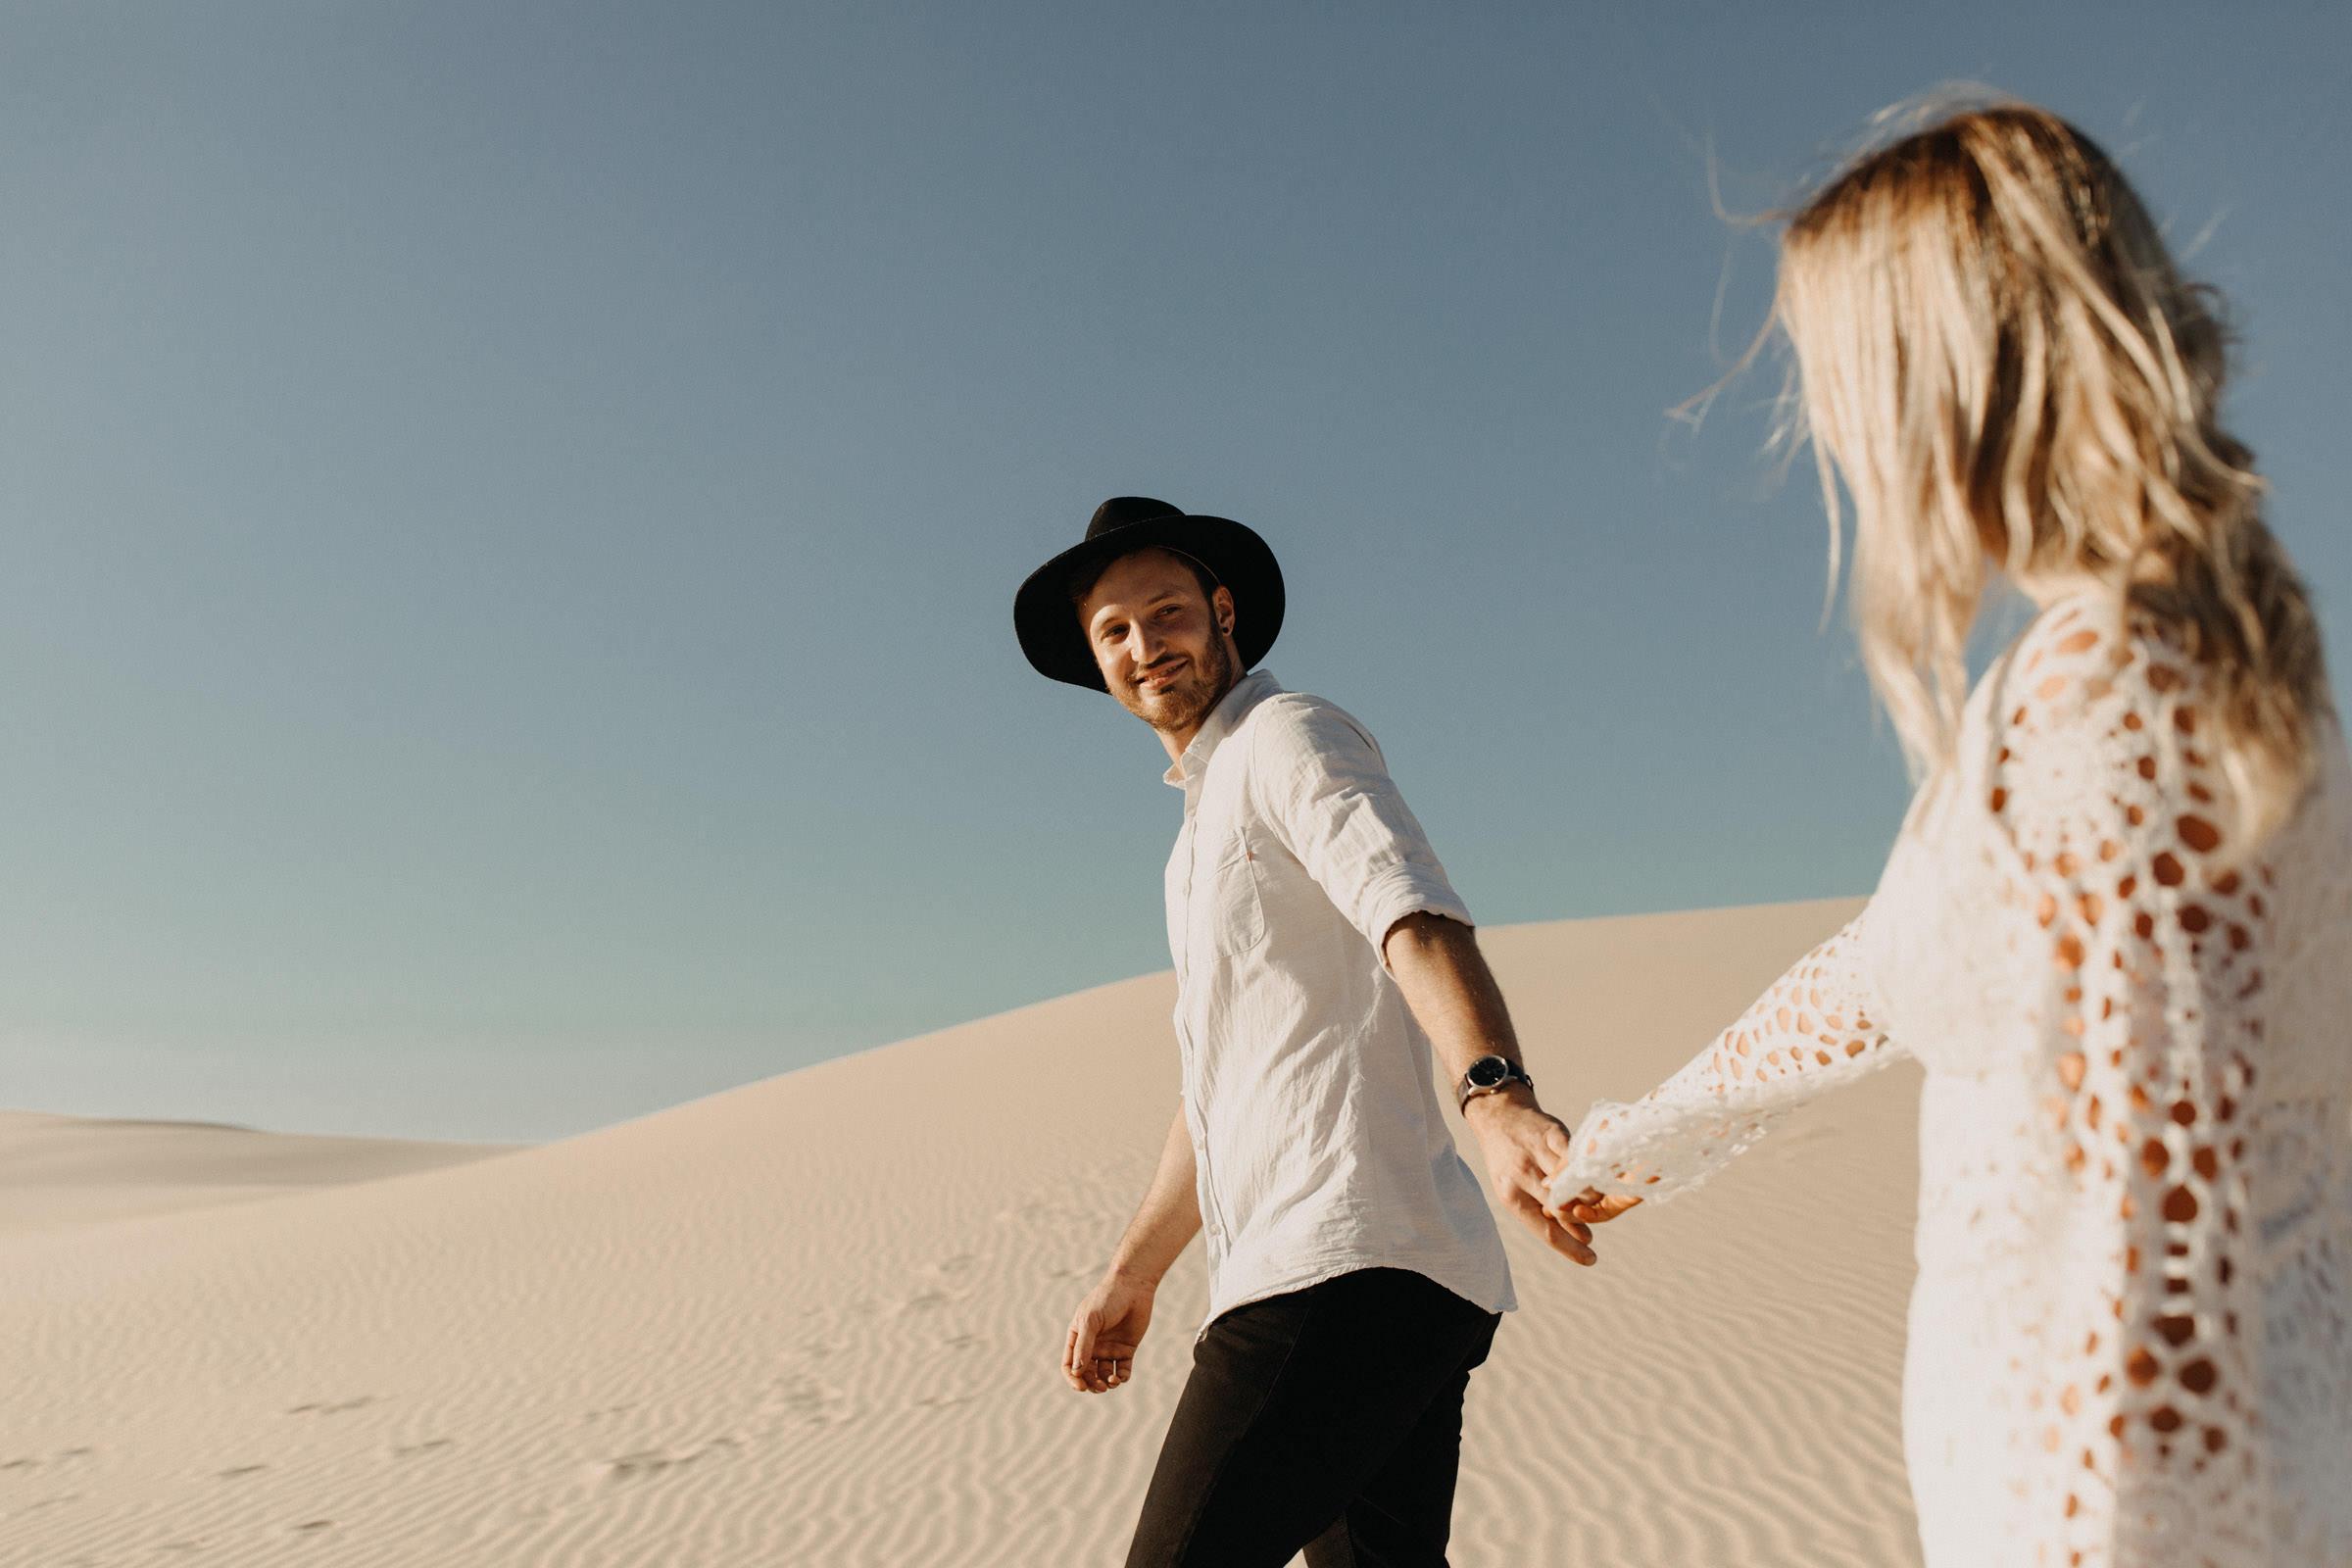 Stockon-sand-dunes-shoot-7.jpg